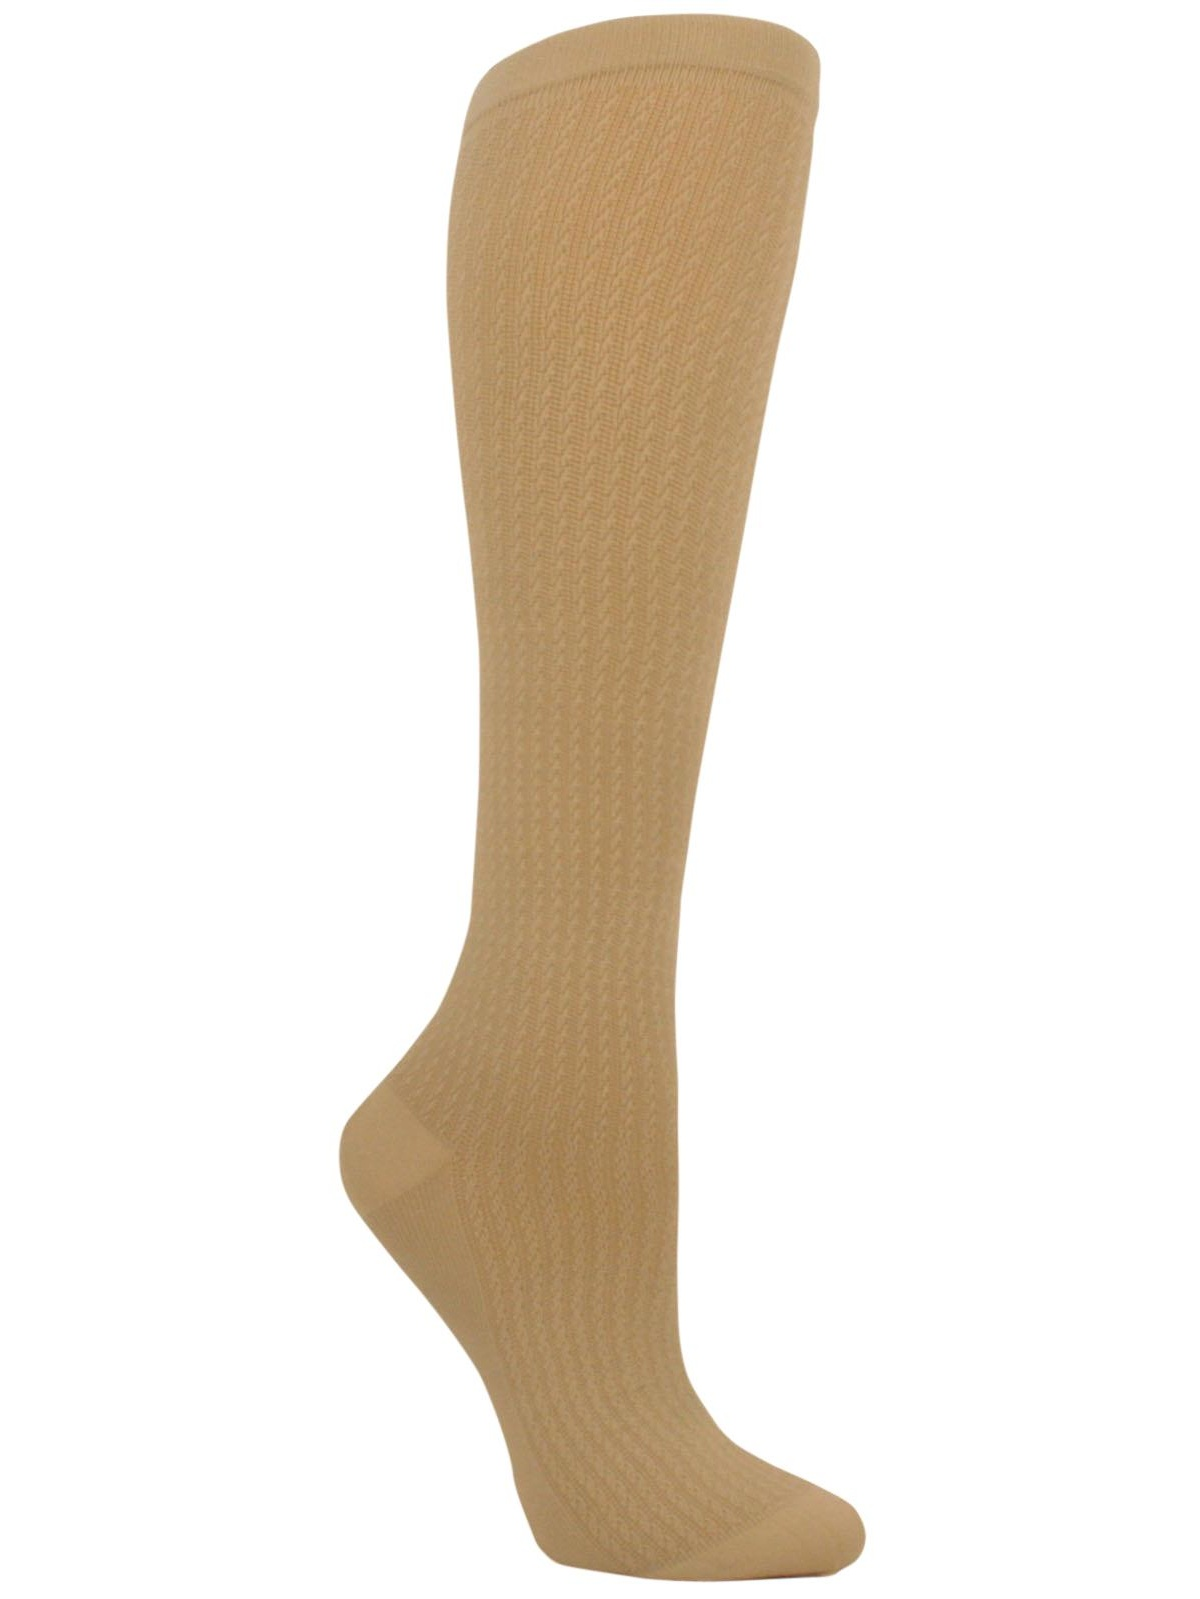 96d2d007d46 Dr. Scholls Womens Graduated Compression Knee High Socks